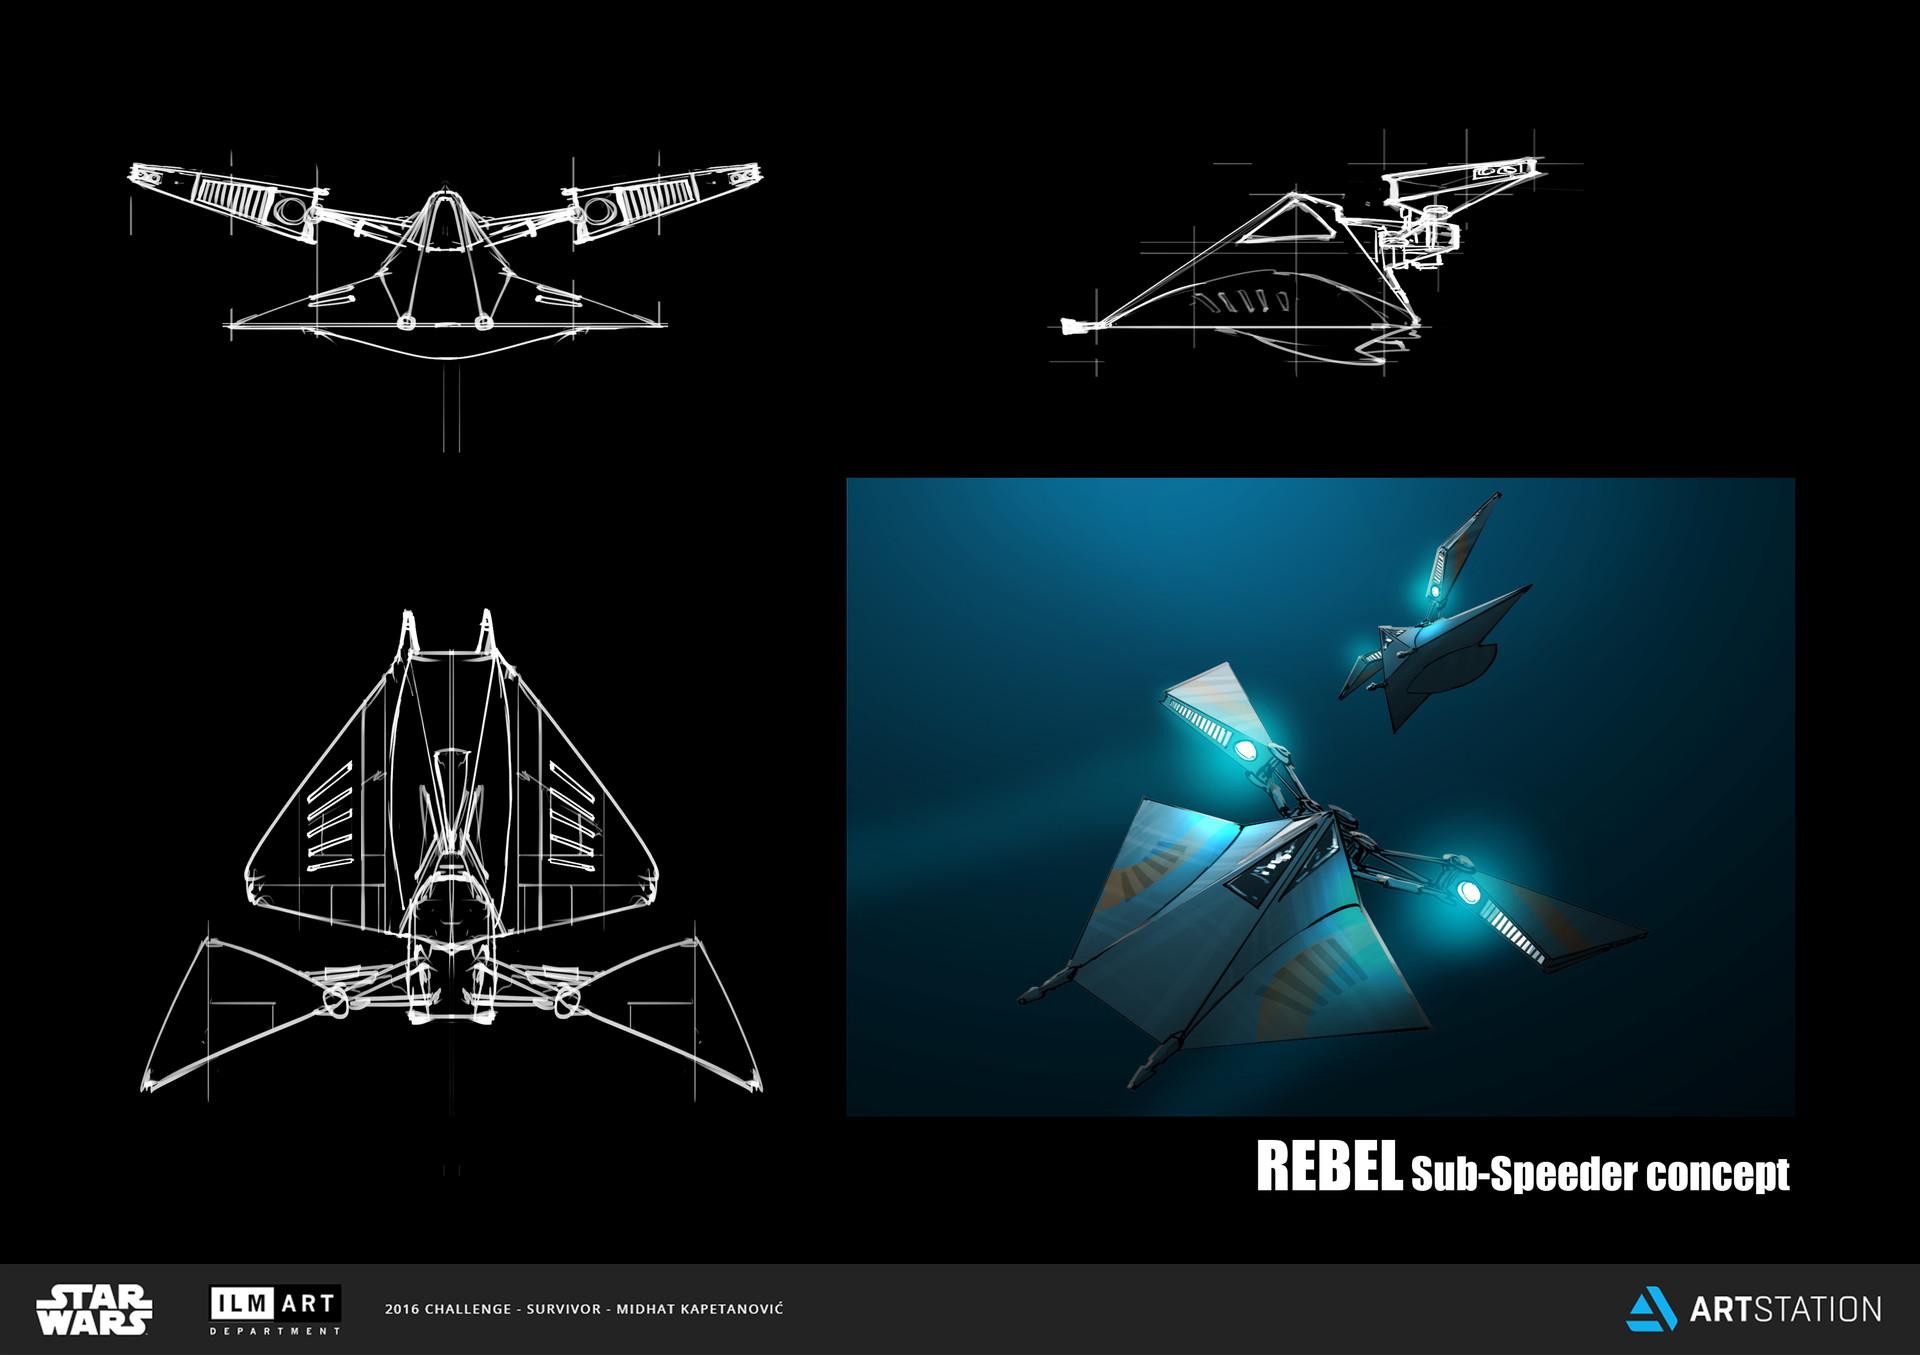 Midhat kapetanovic concepts rebelsubspeeder02